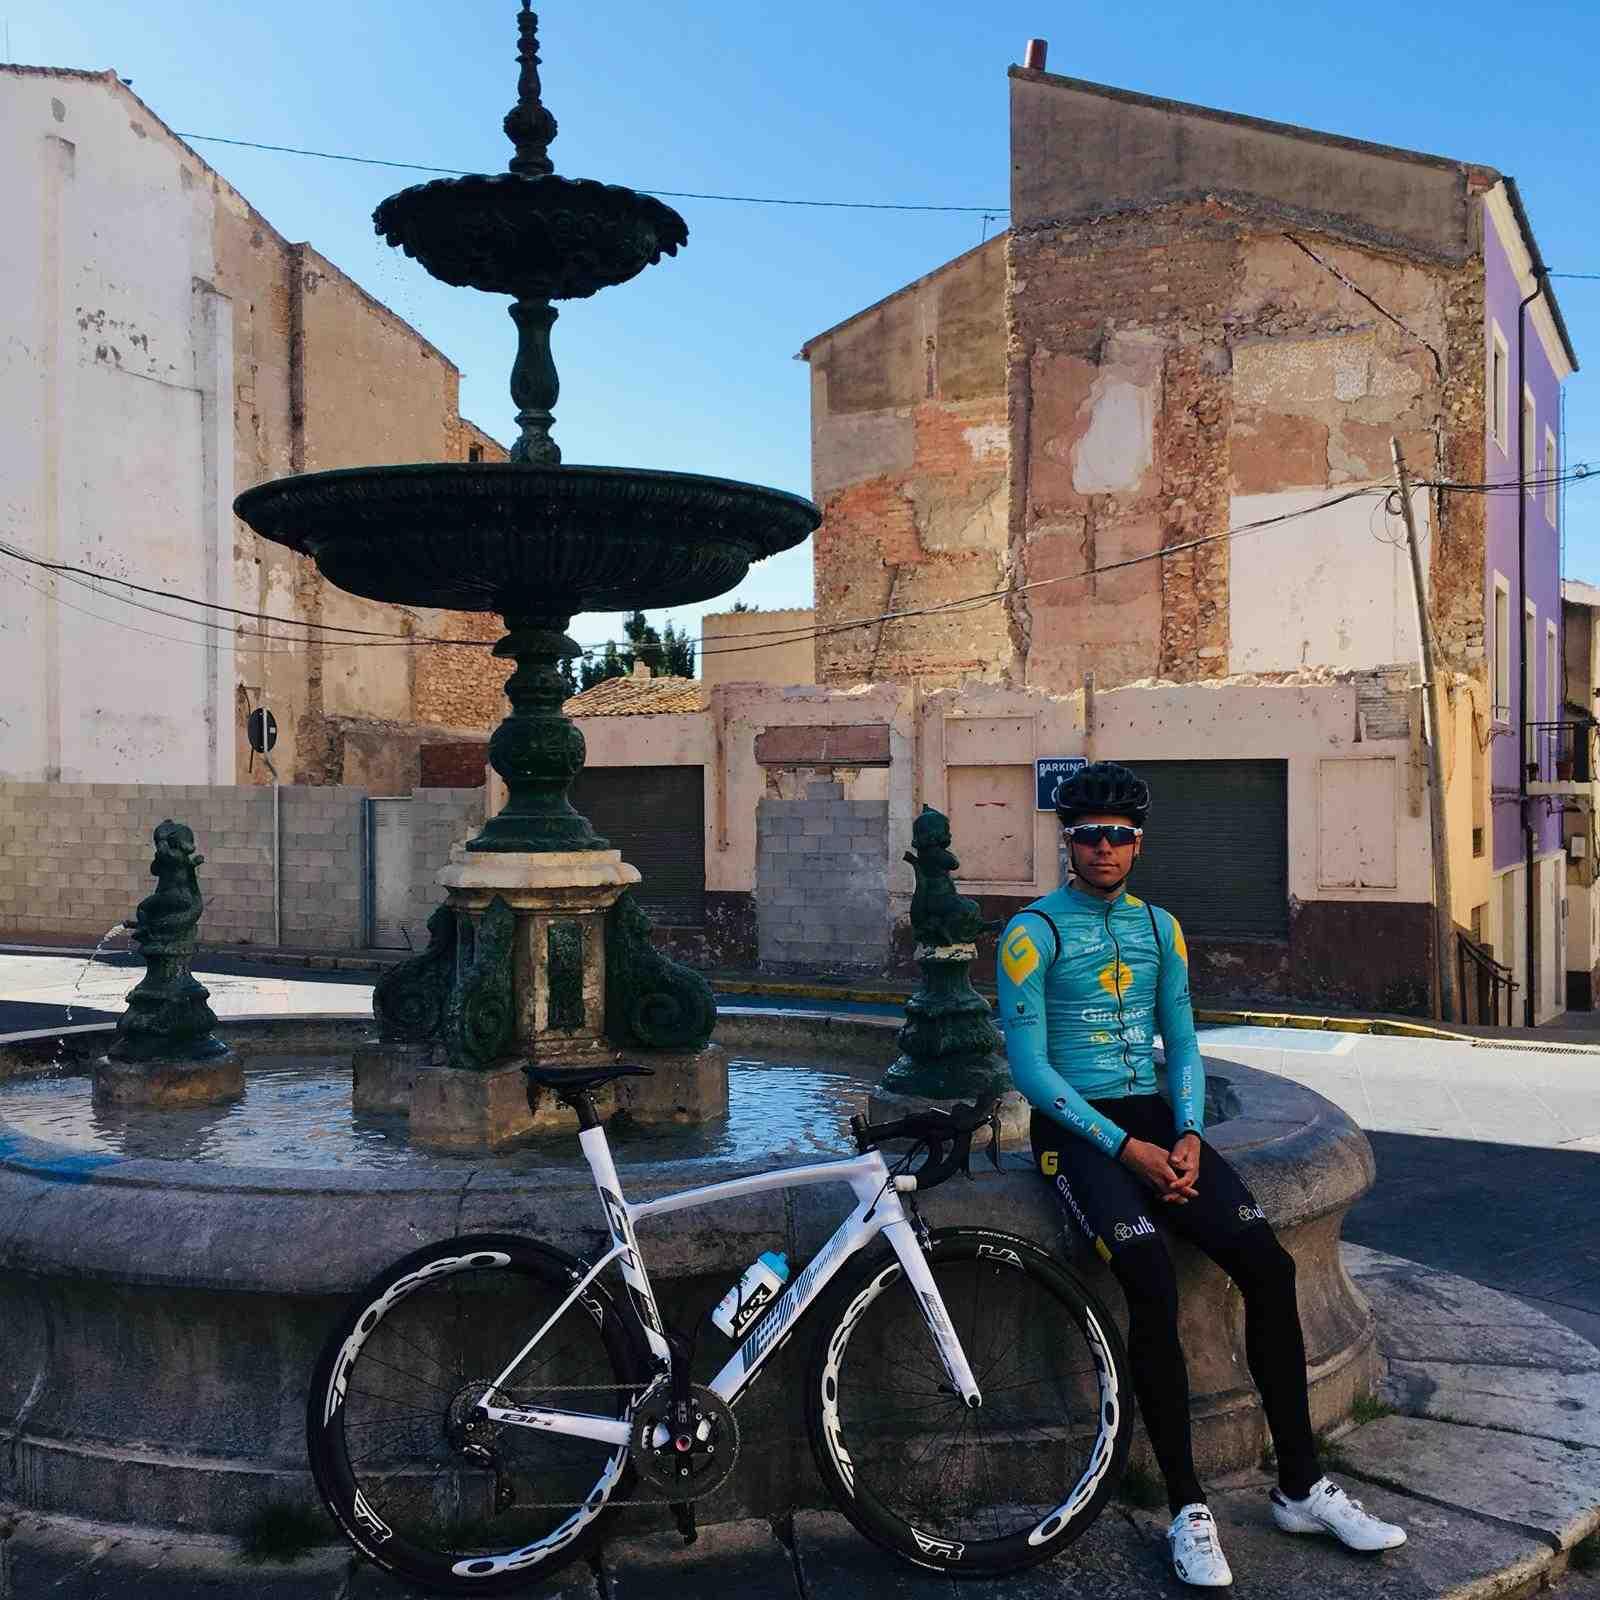 El ciclista ibense Josué Gómez participa en el Tour du Maroc